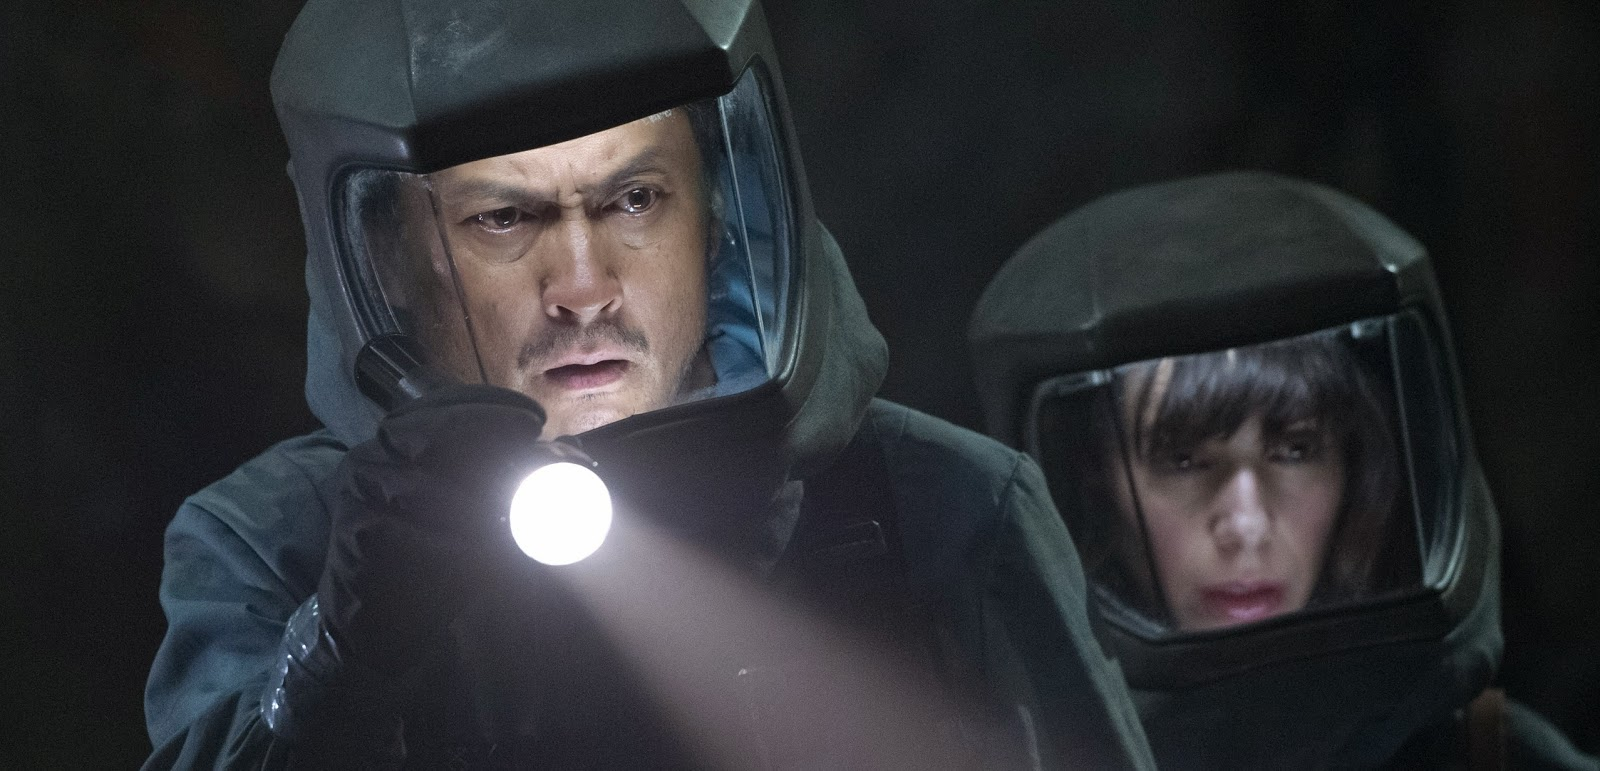 Bryan Cranston, Ken Watanabe, ELizabeth Olsen e Aaron Johnson em imagens inéditas de Godzilla